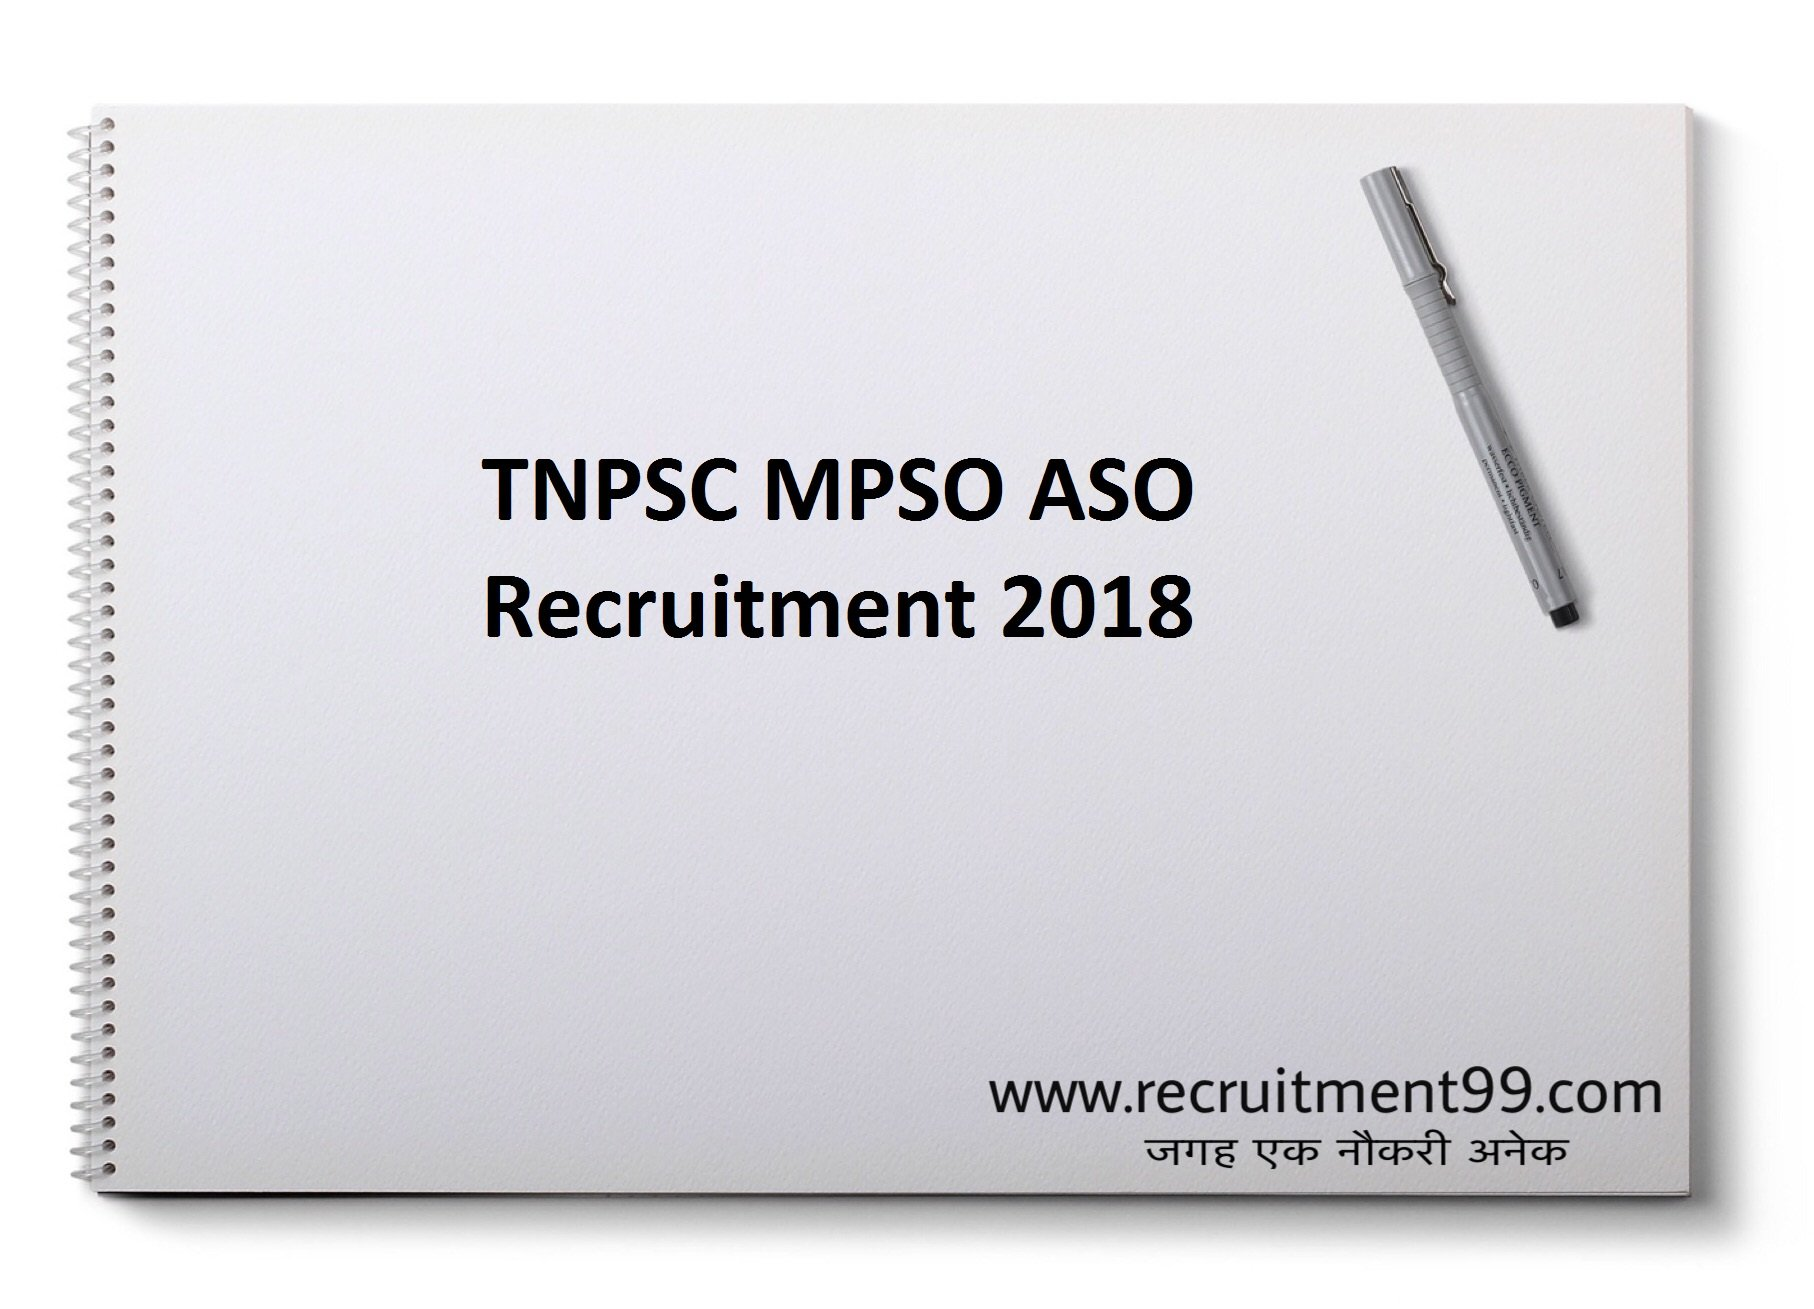 TNPSC MPSO ASO Recruitment Hall ticket Result 2018